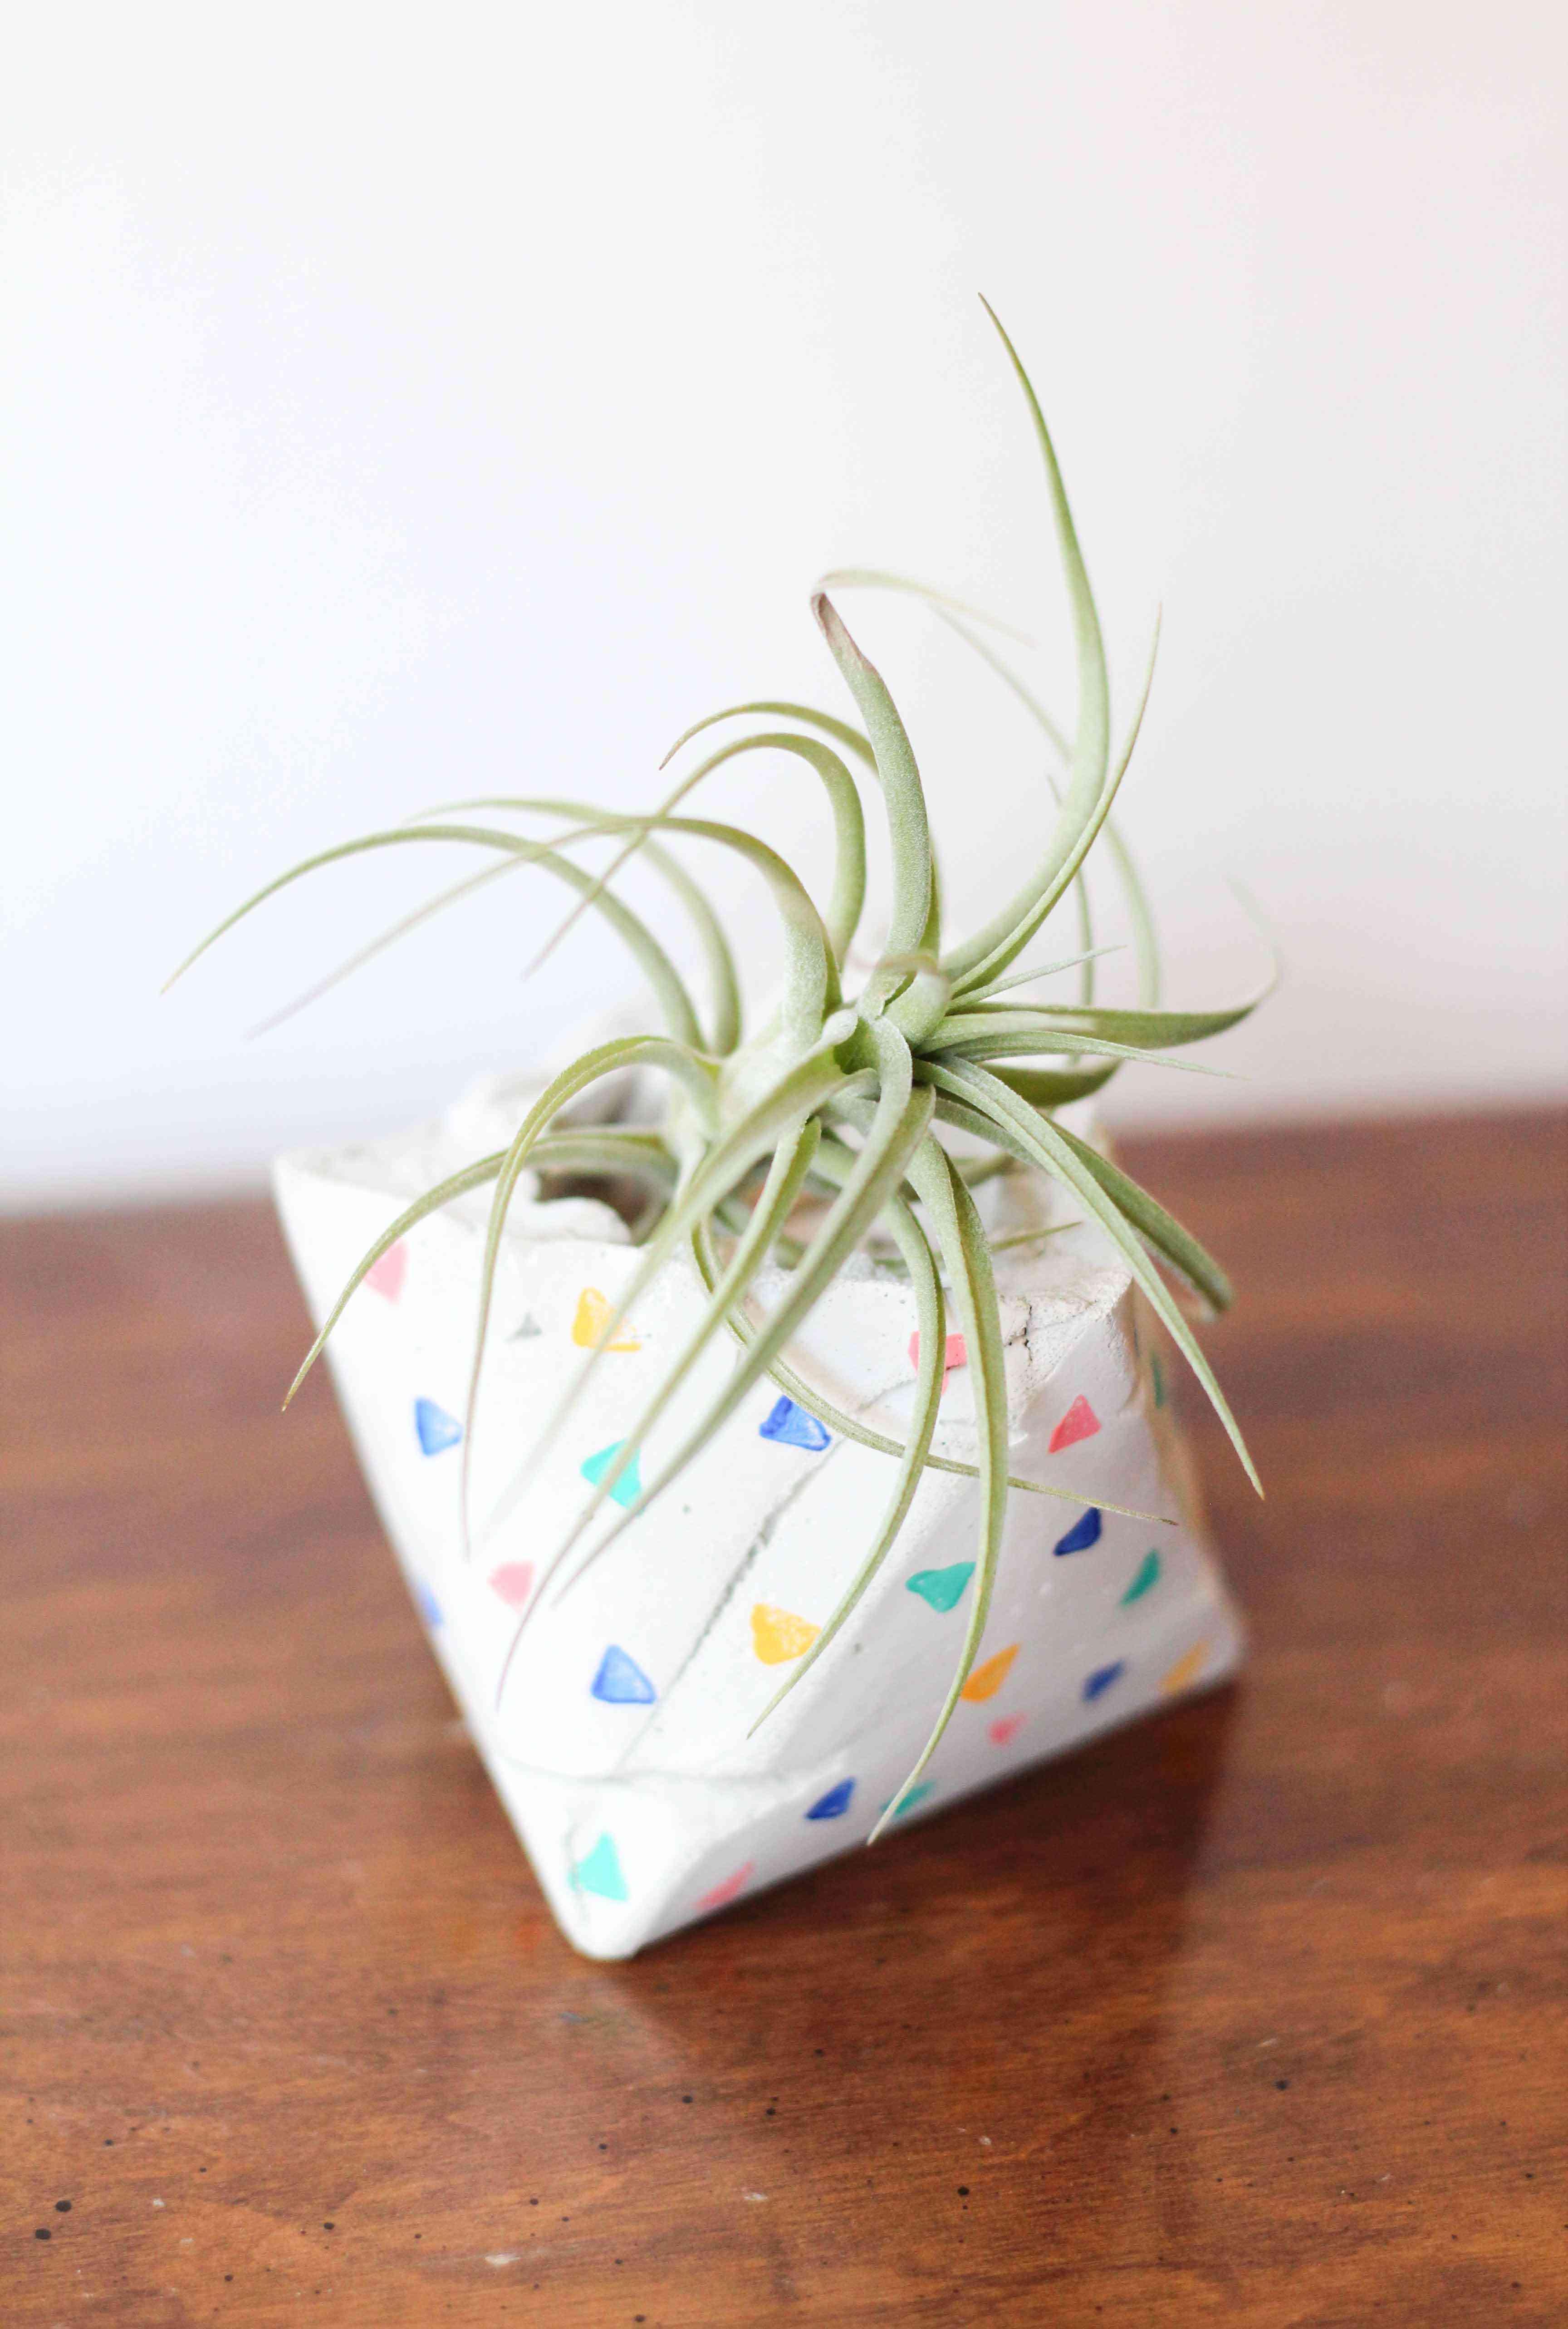 A colorful cement geometric planter